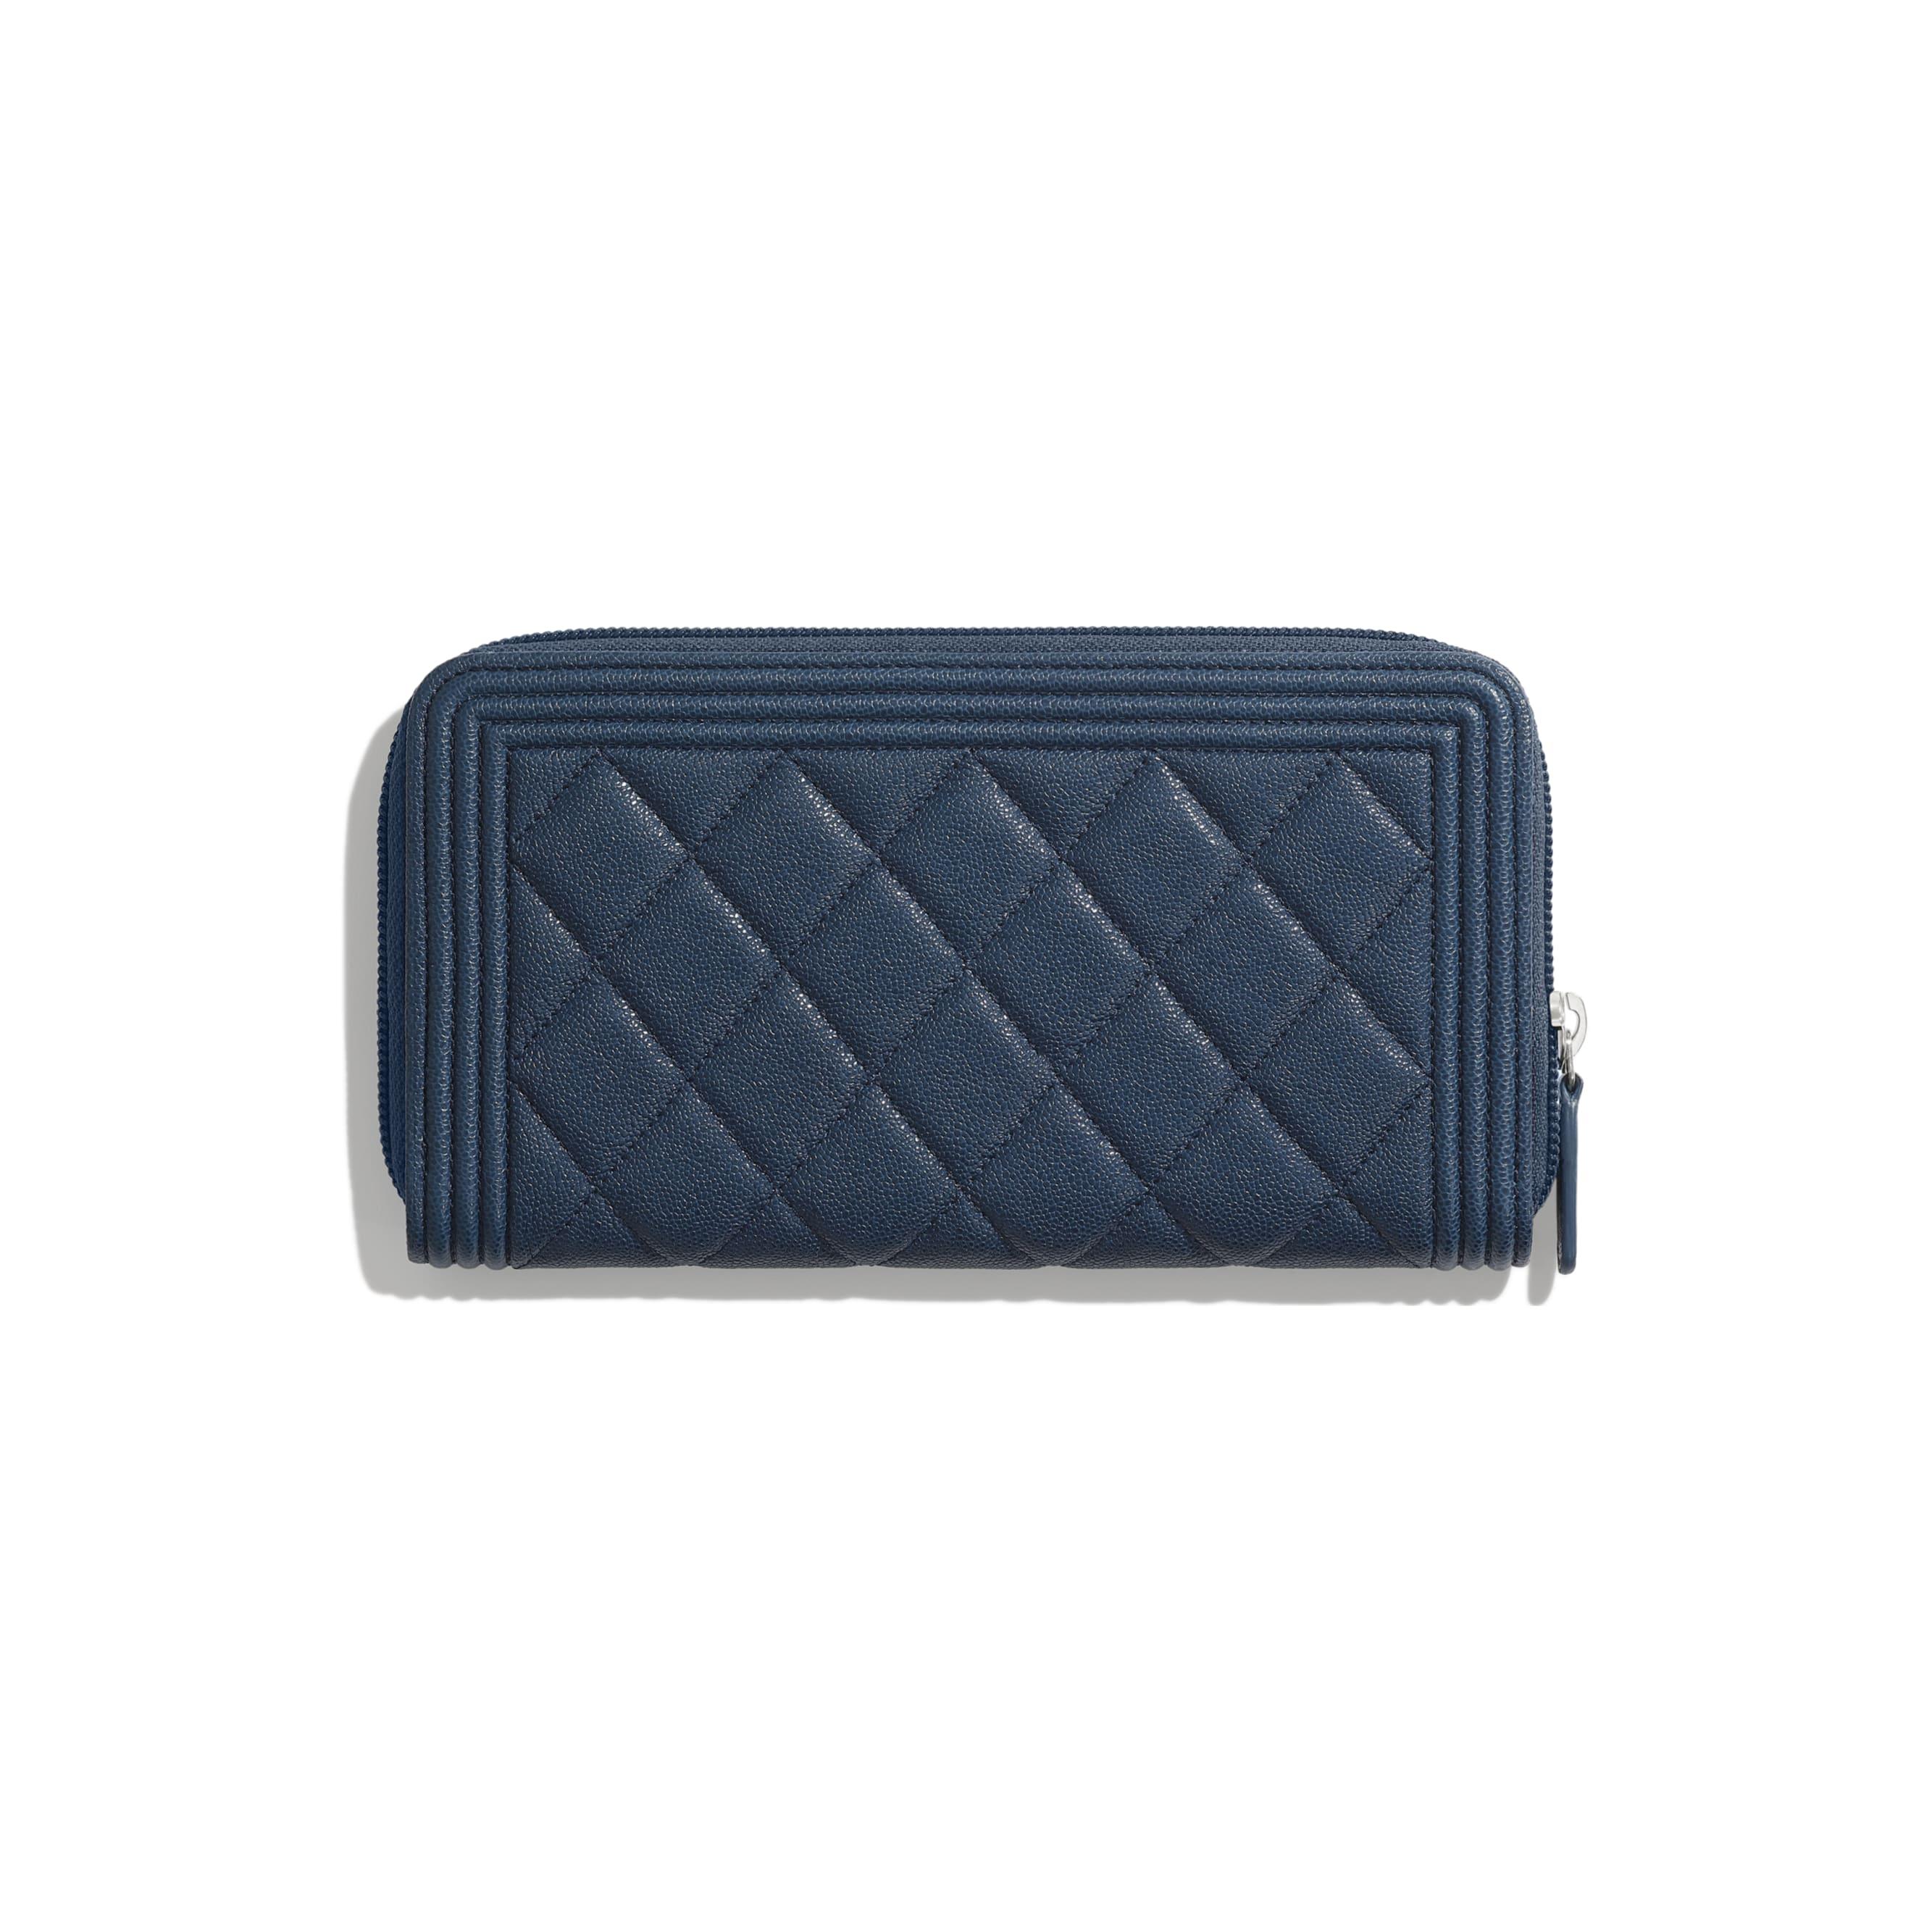 BOY CHANEL Long Zipped Wallet - Blue - Grained Calfskin & Silver Metal - Alternative view - see standard sized version